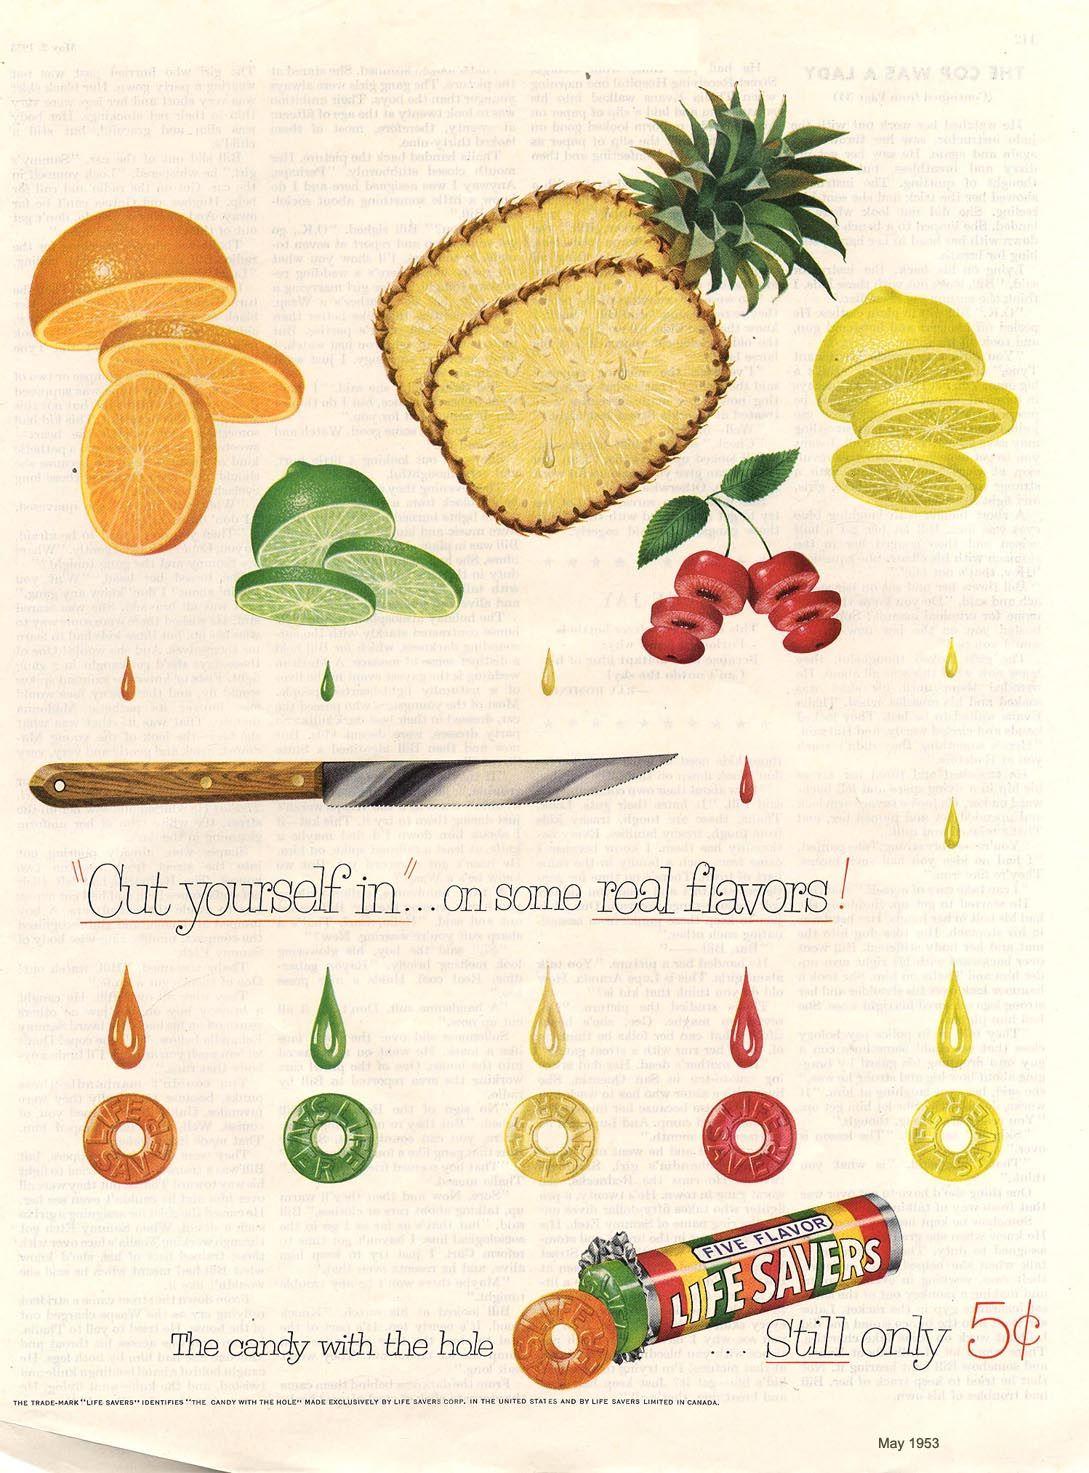 Cut Life Savers Ad Lifesavers Life Savers Ads Vintage Ads